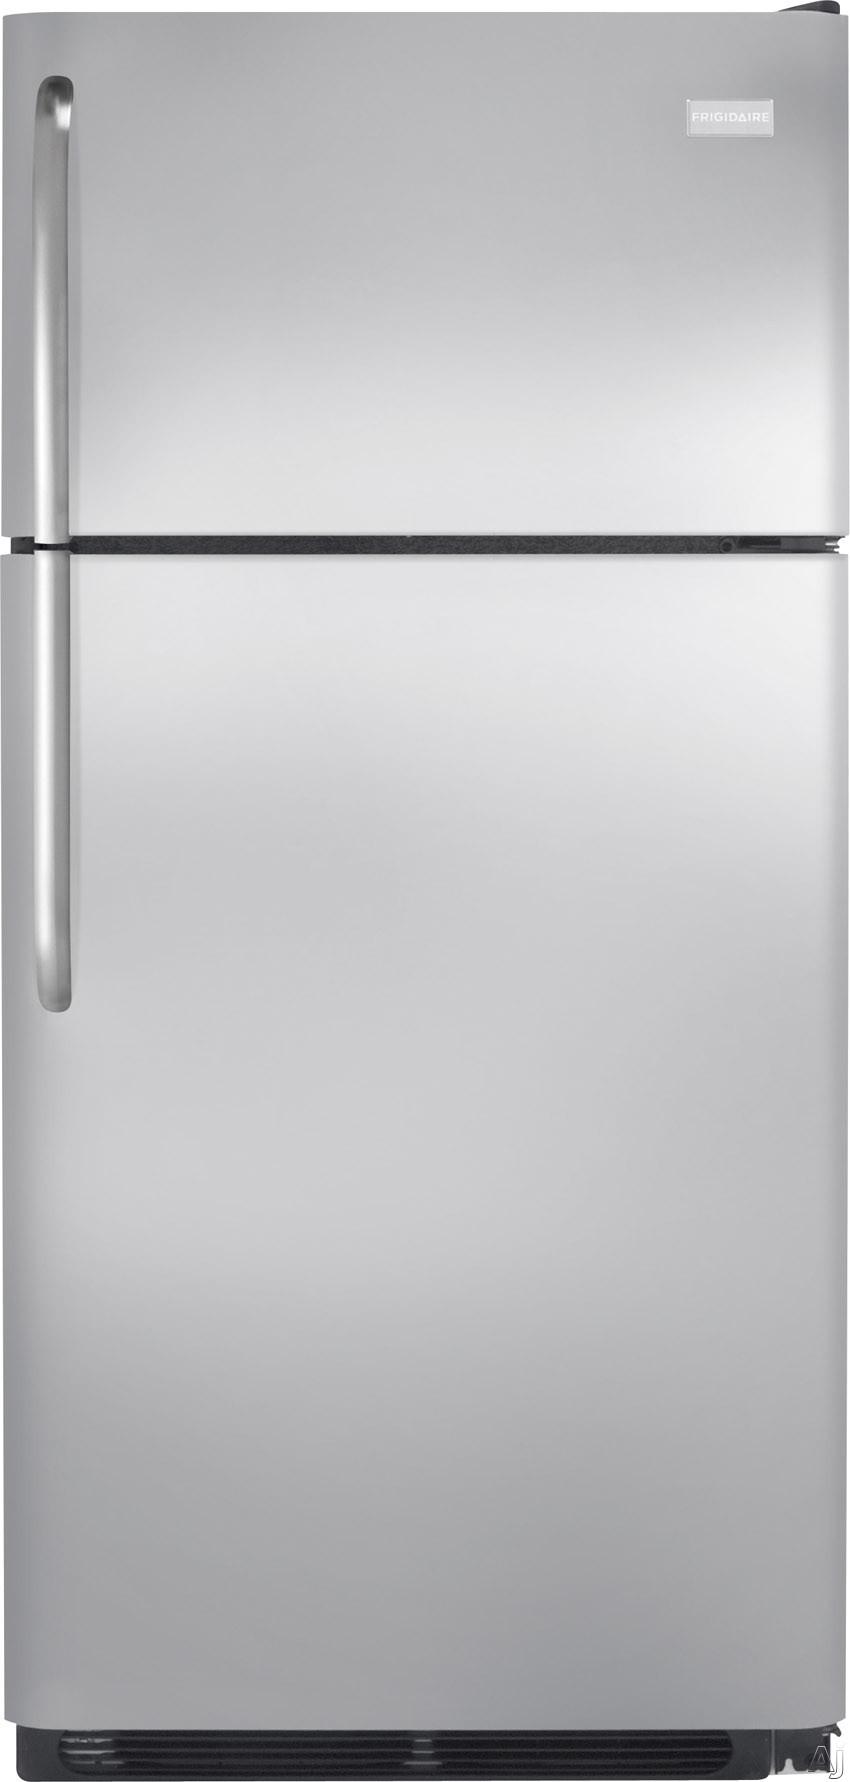 Frigidaire FFHI1831Q 30 Inch Top-Freezer Refrigerator with 18.0 cu. ft. Capacity, 2 SpillSafe Glass Shelves, Gallon Door Storage, 2 Crisper Drawers, 1 Deli Drawer, 3 Door Racks, Covered Dairy Bin, ADA Compliant, ENERGY STAR Qualified and Ice Maker